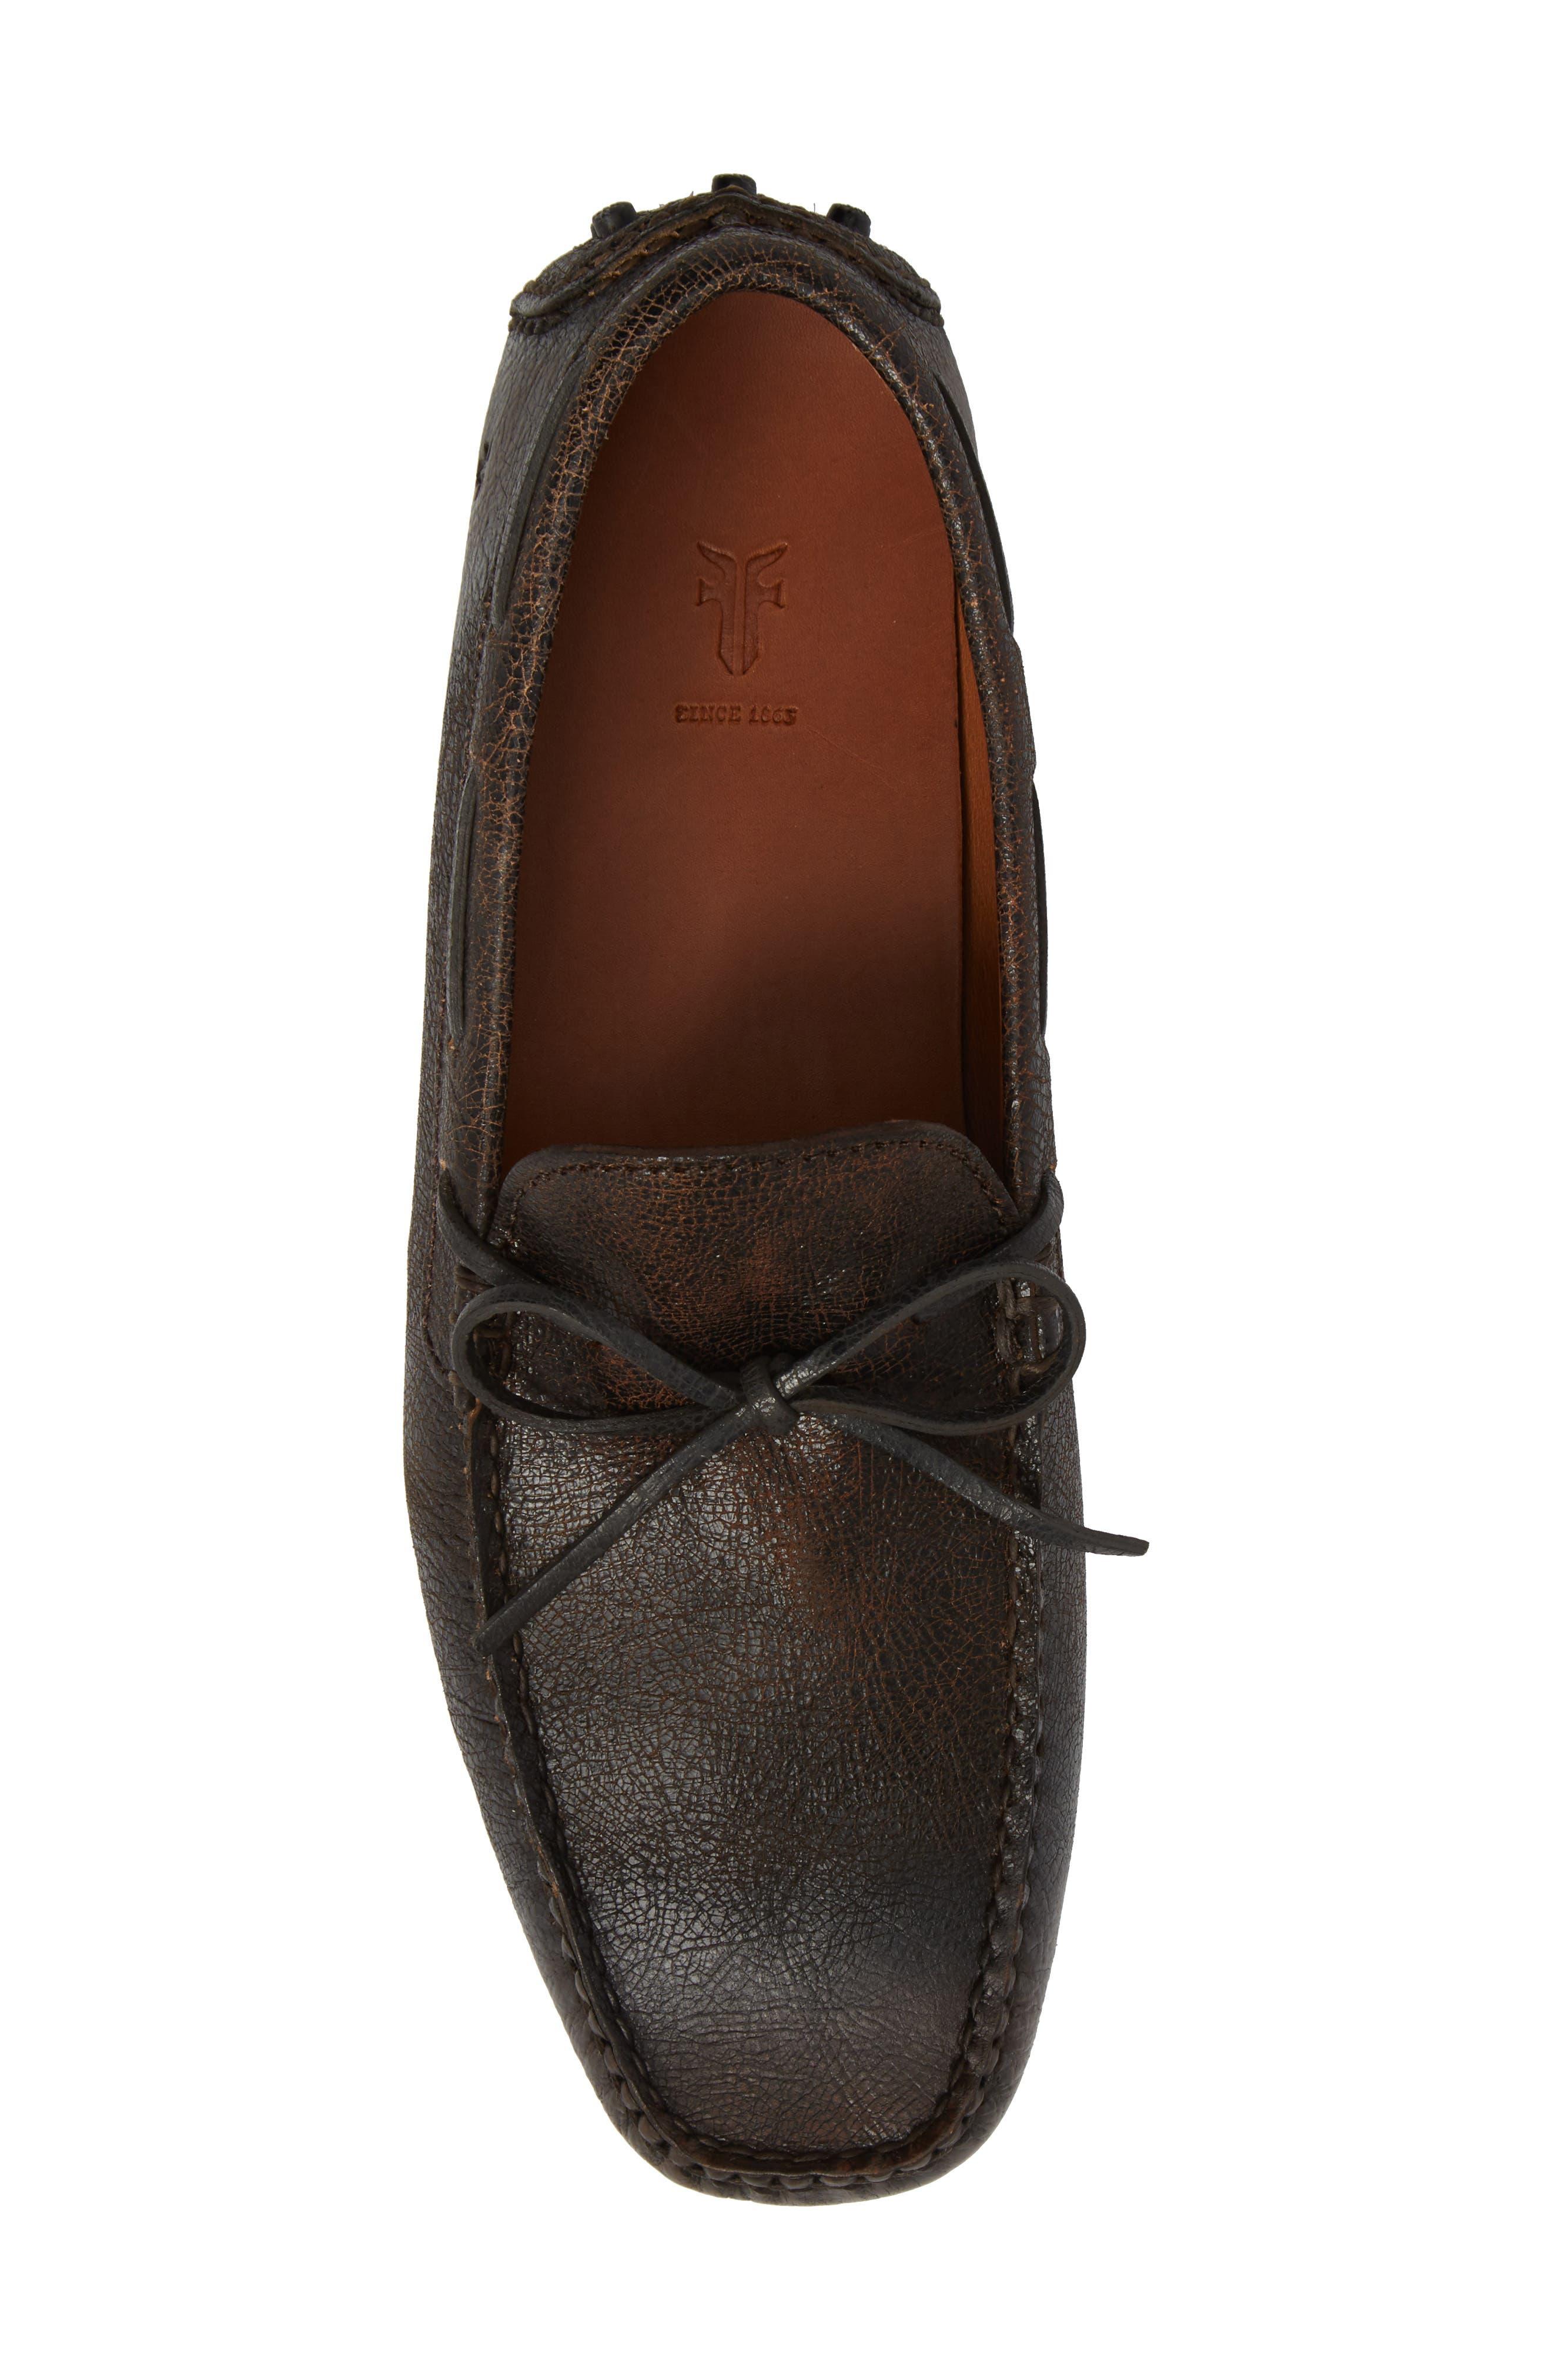 Allen Loafer,                             Alternate thumbnail 5, color,                             Dark Brown Leather